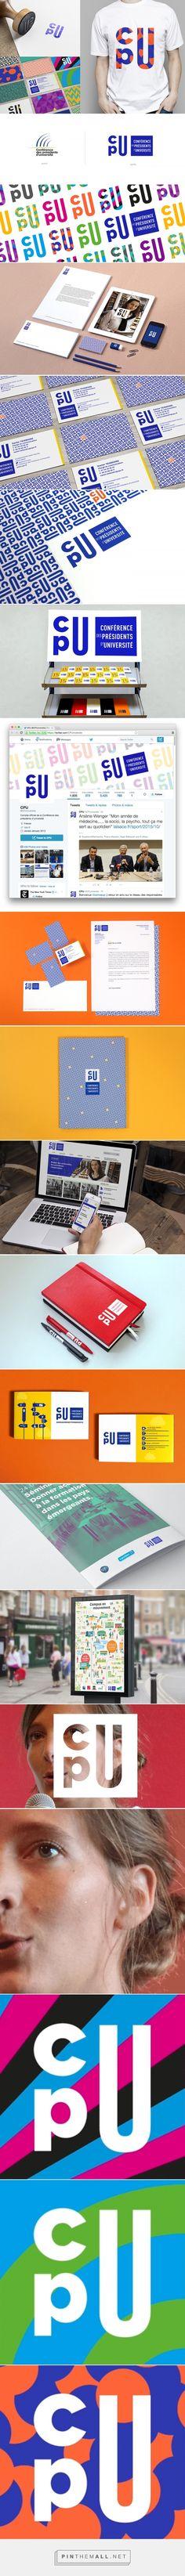 CPU - Brand design on Behance - created via https://pinthemall.net